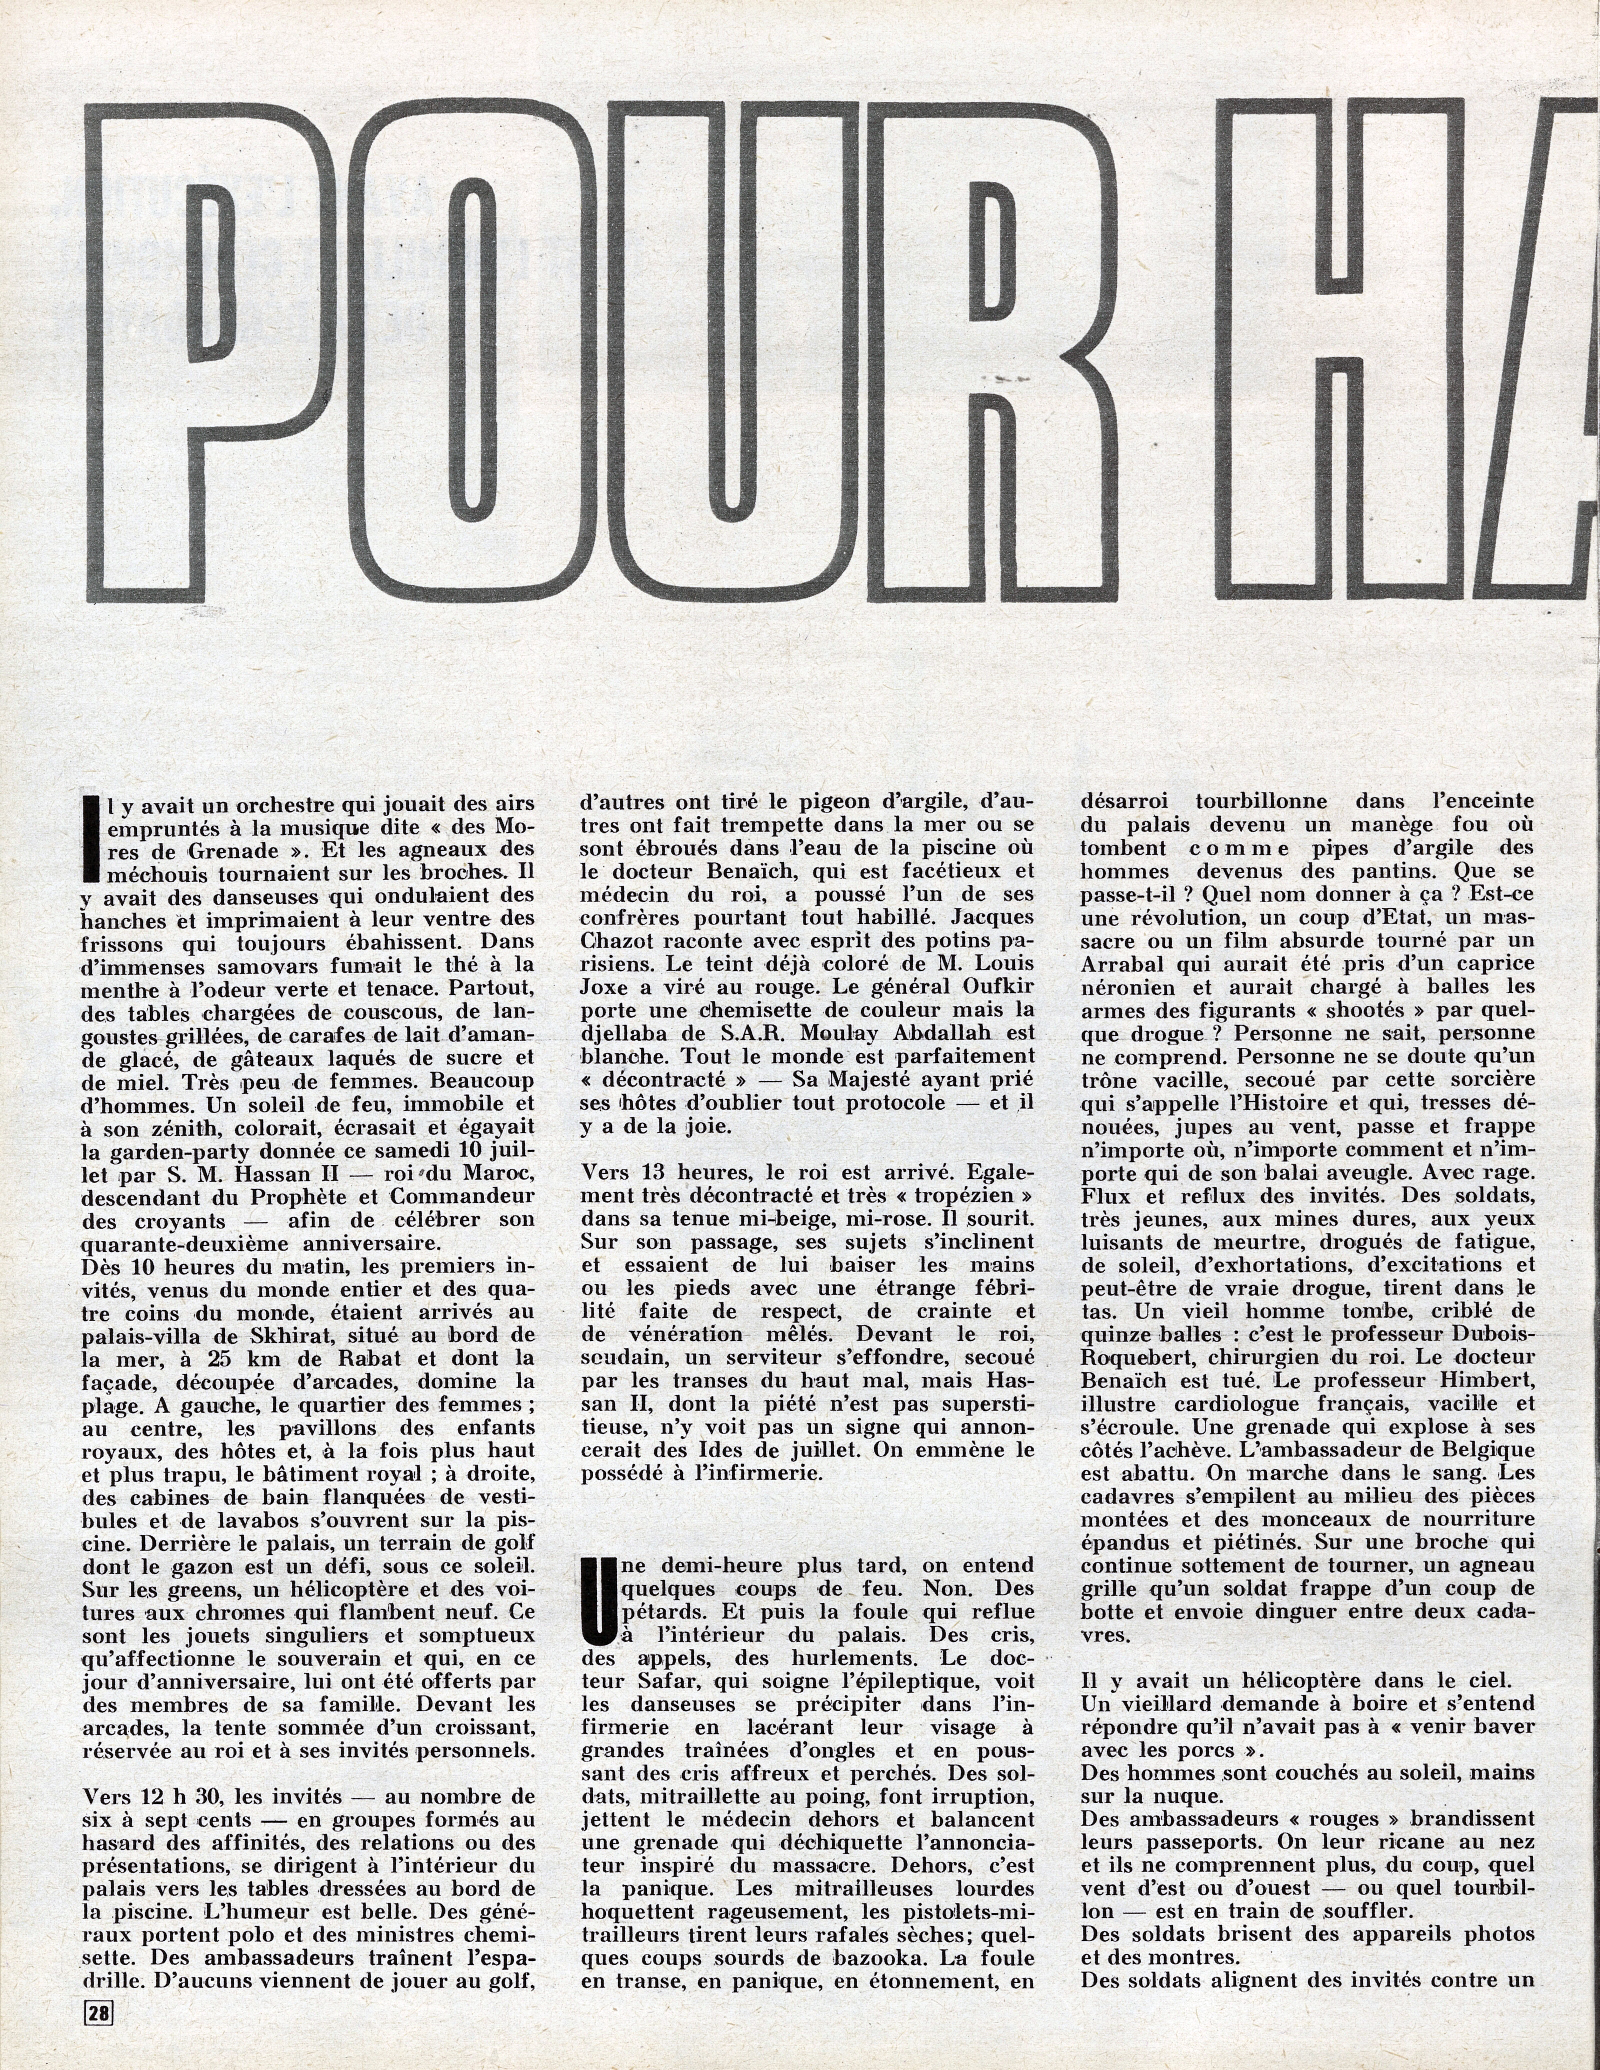 Tentative de coup d'État à Rabat et Skhirate le 10 juillet 1971  48695305503_728a495cef_o